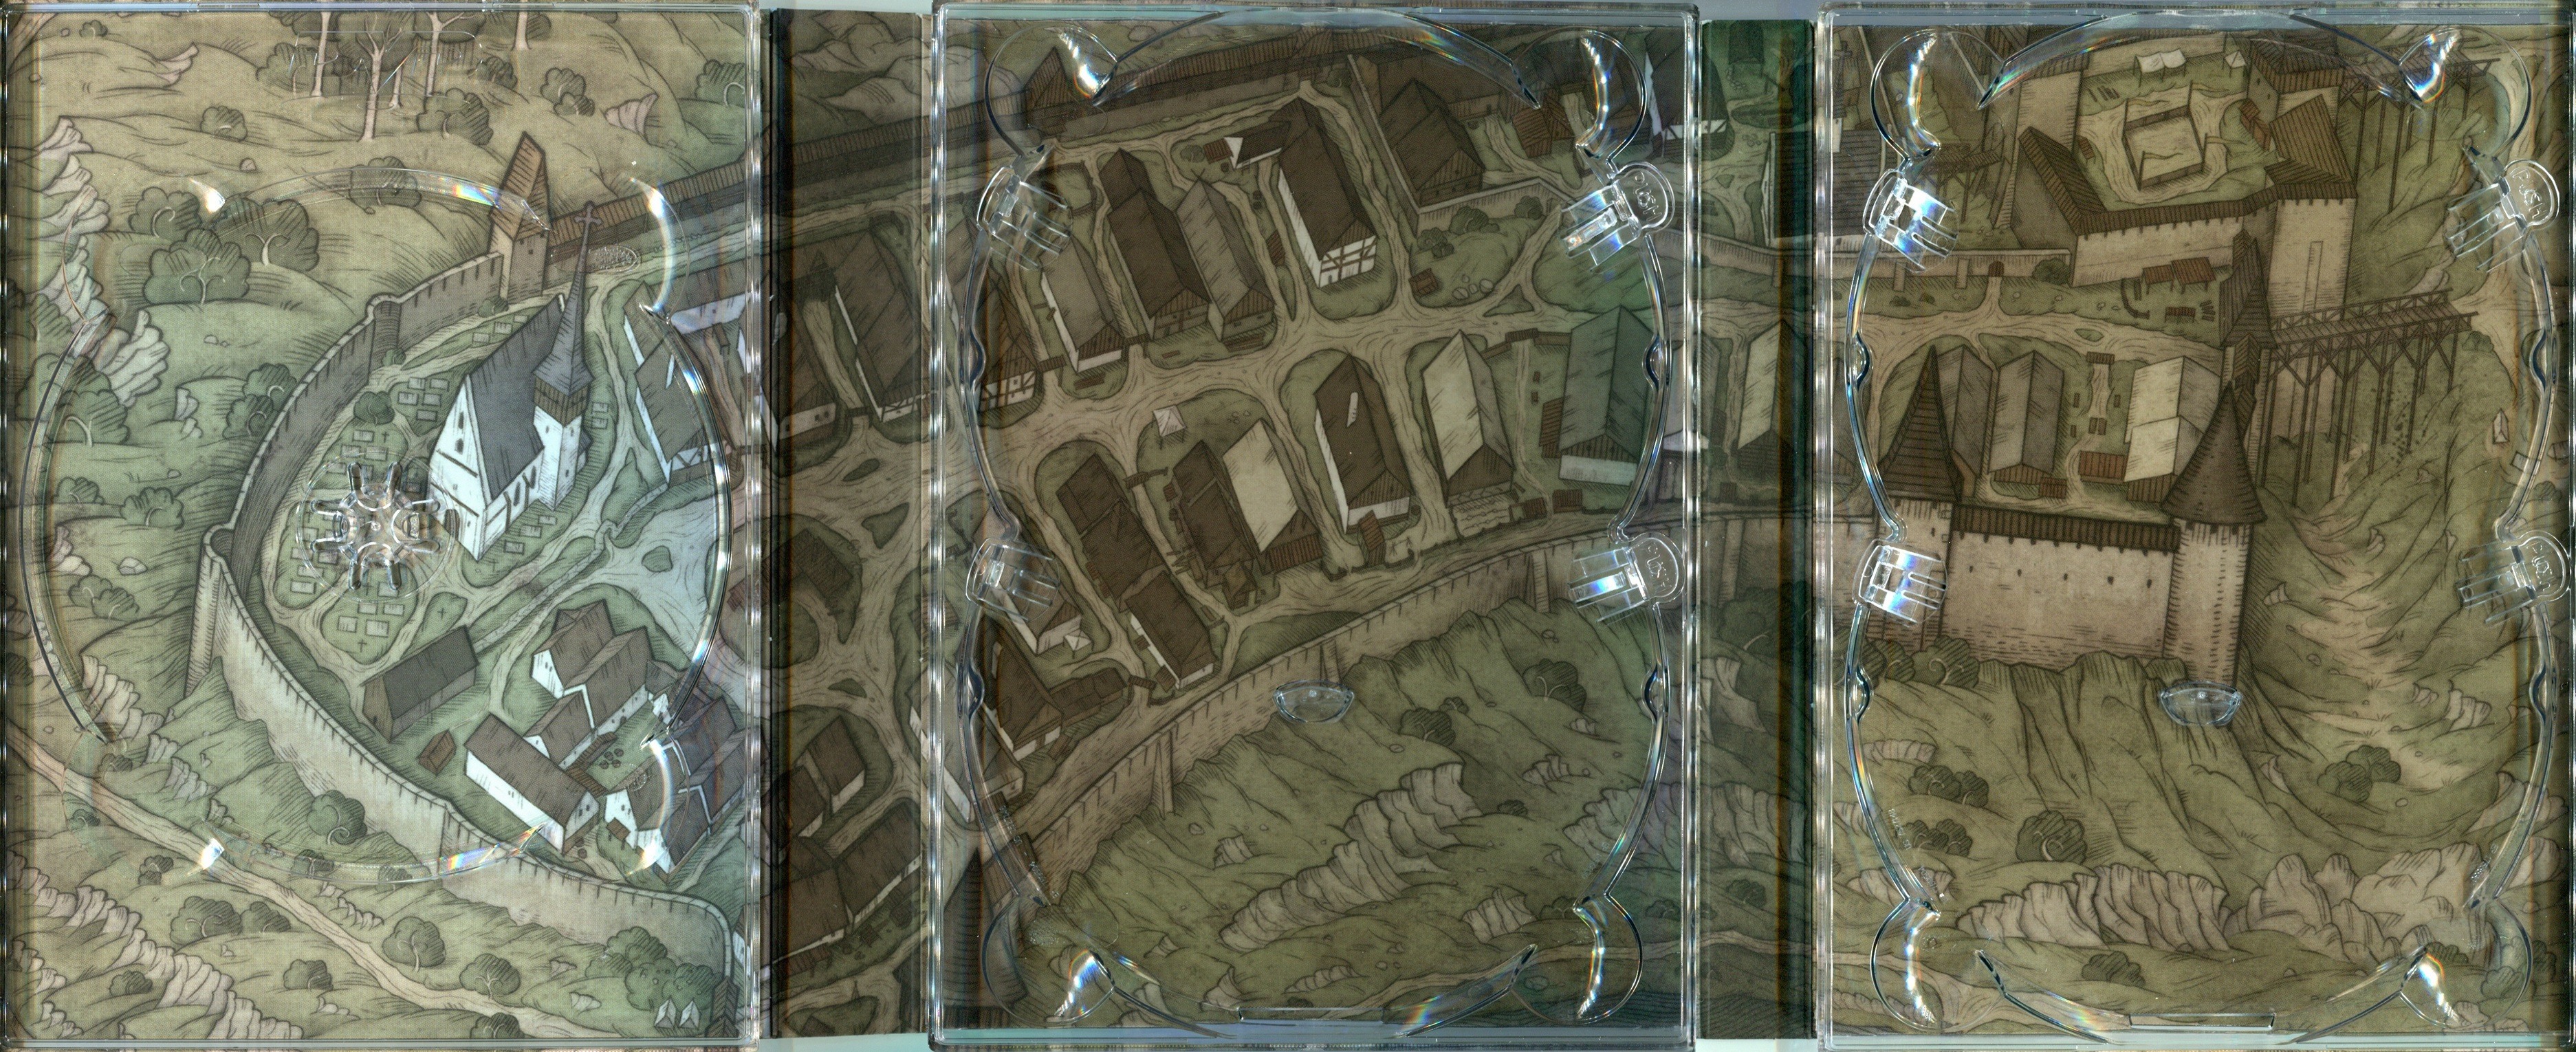 Kingdom Come: Deliverance Official Soundtrack музыка из игры